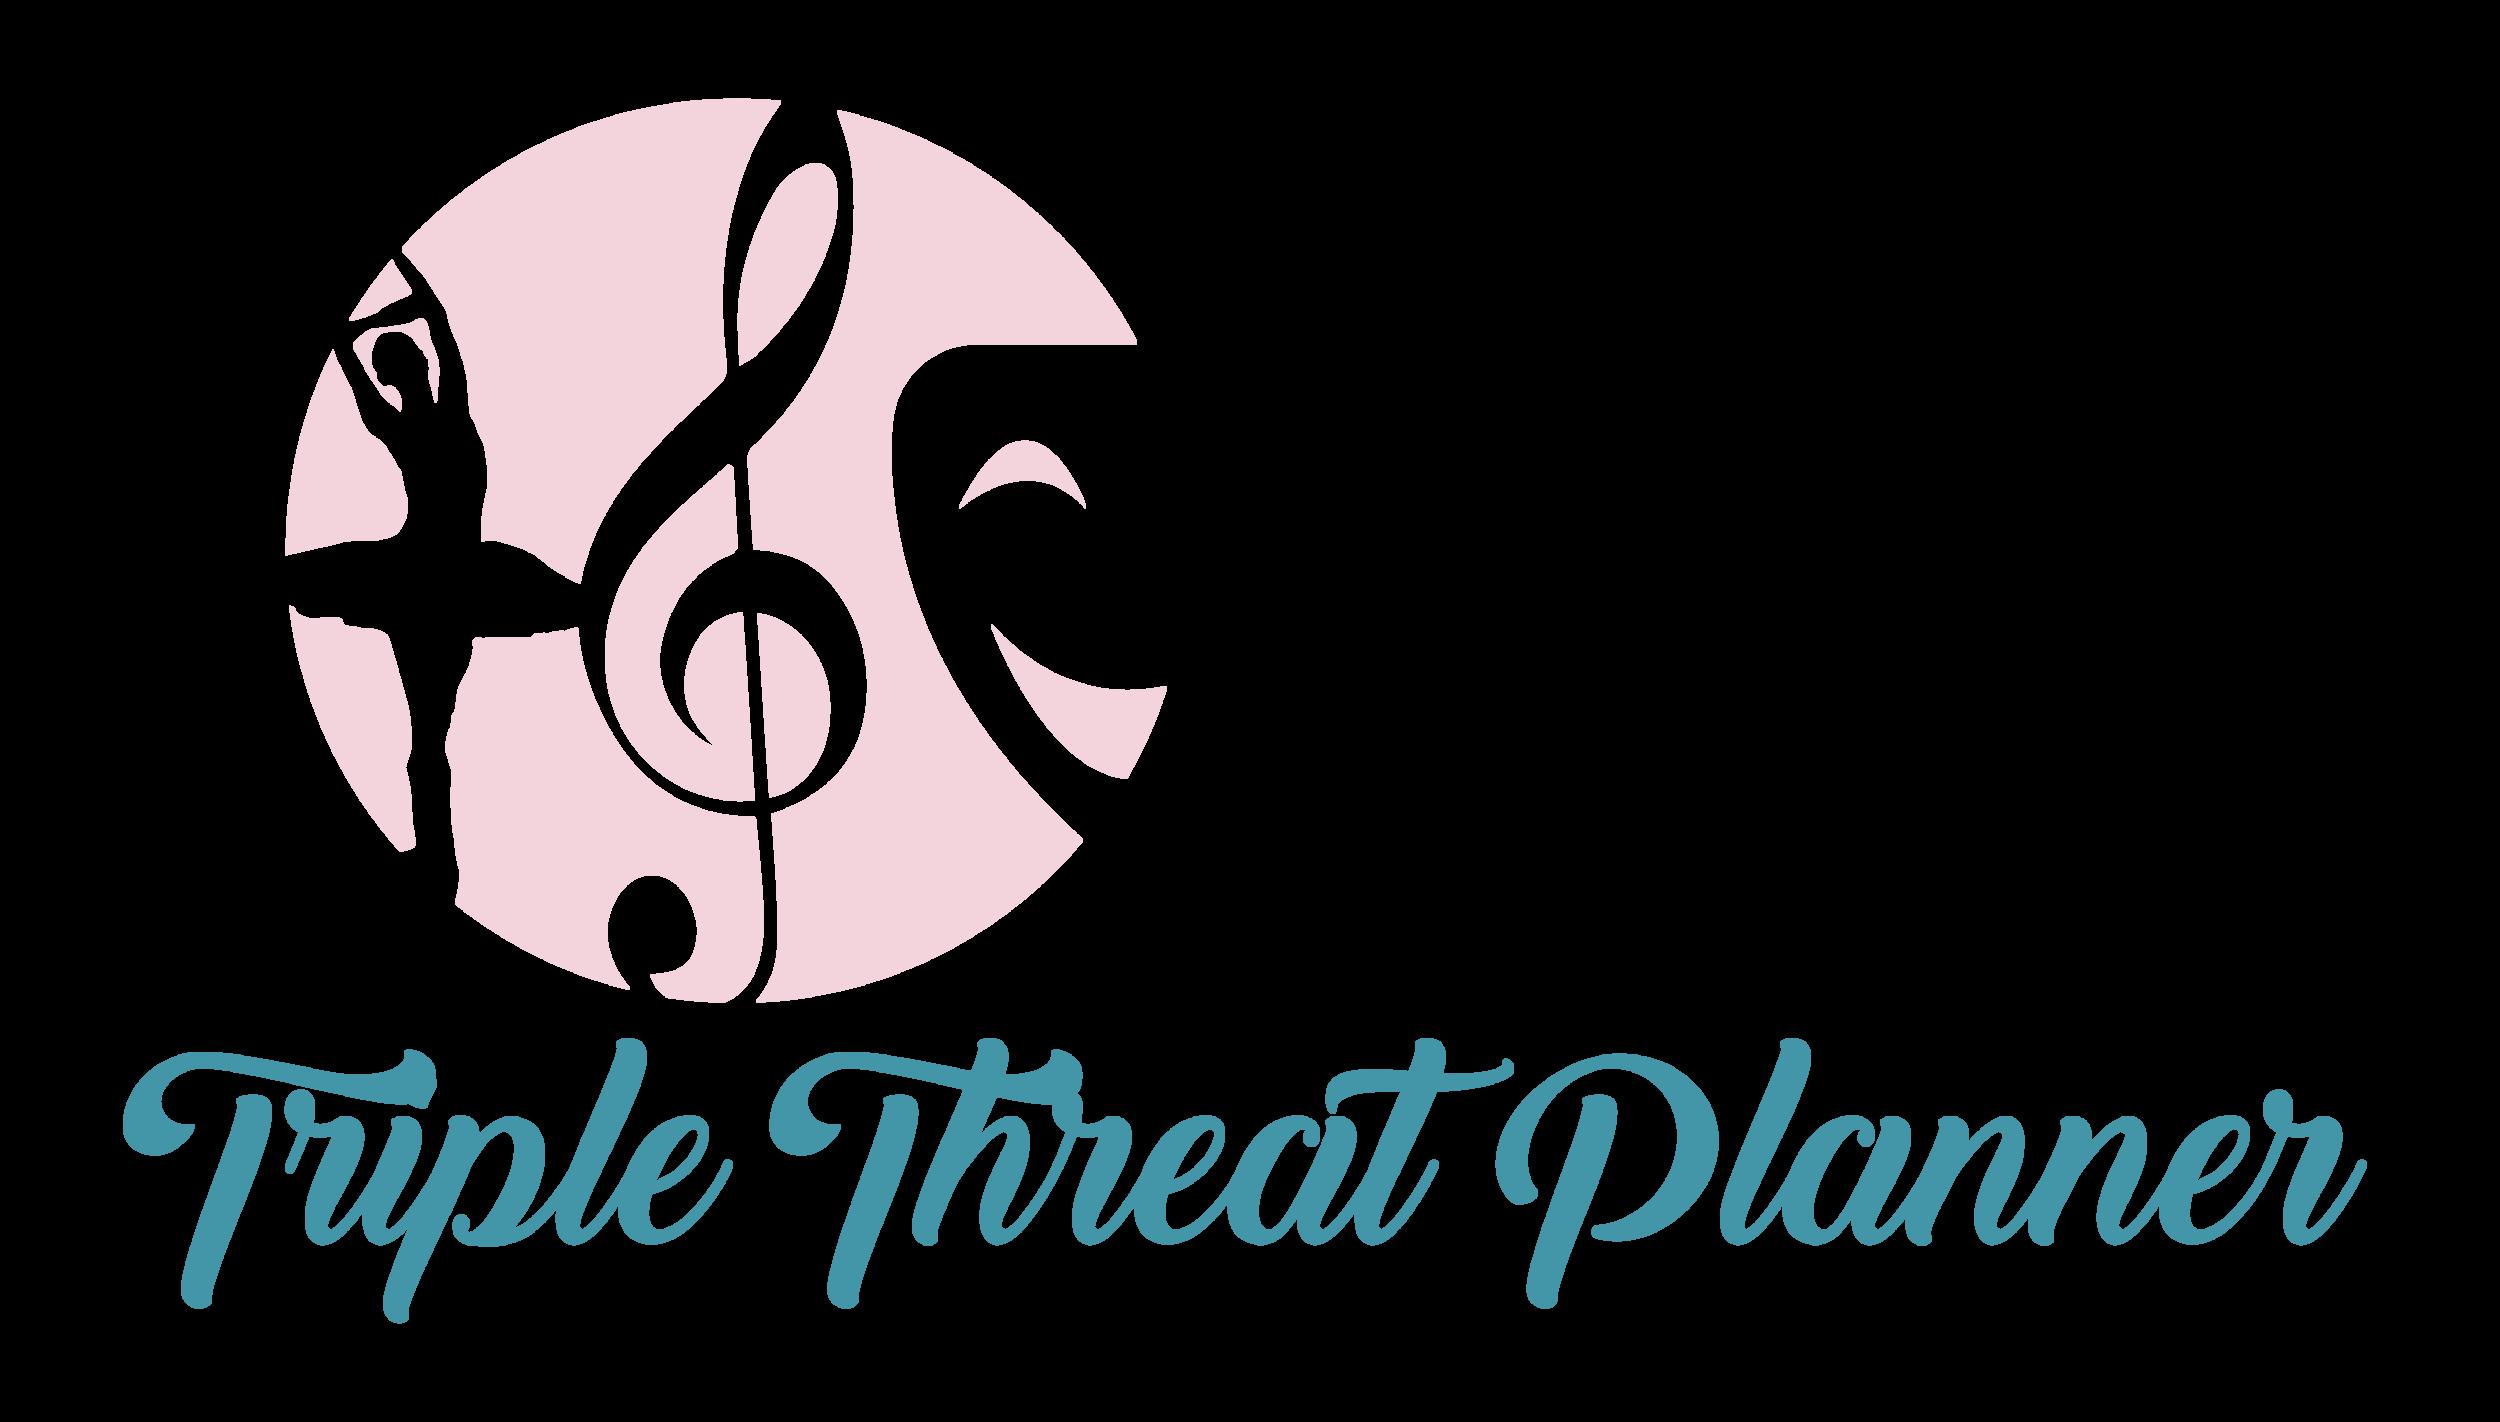 TripleThreatPlanners.png